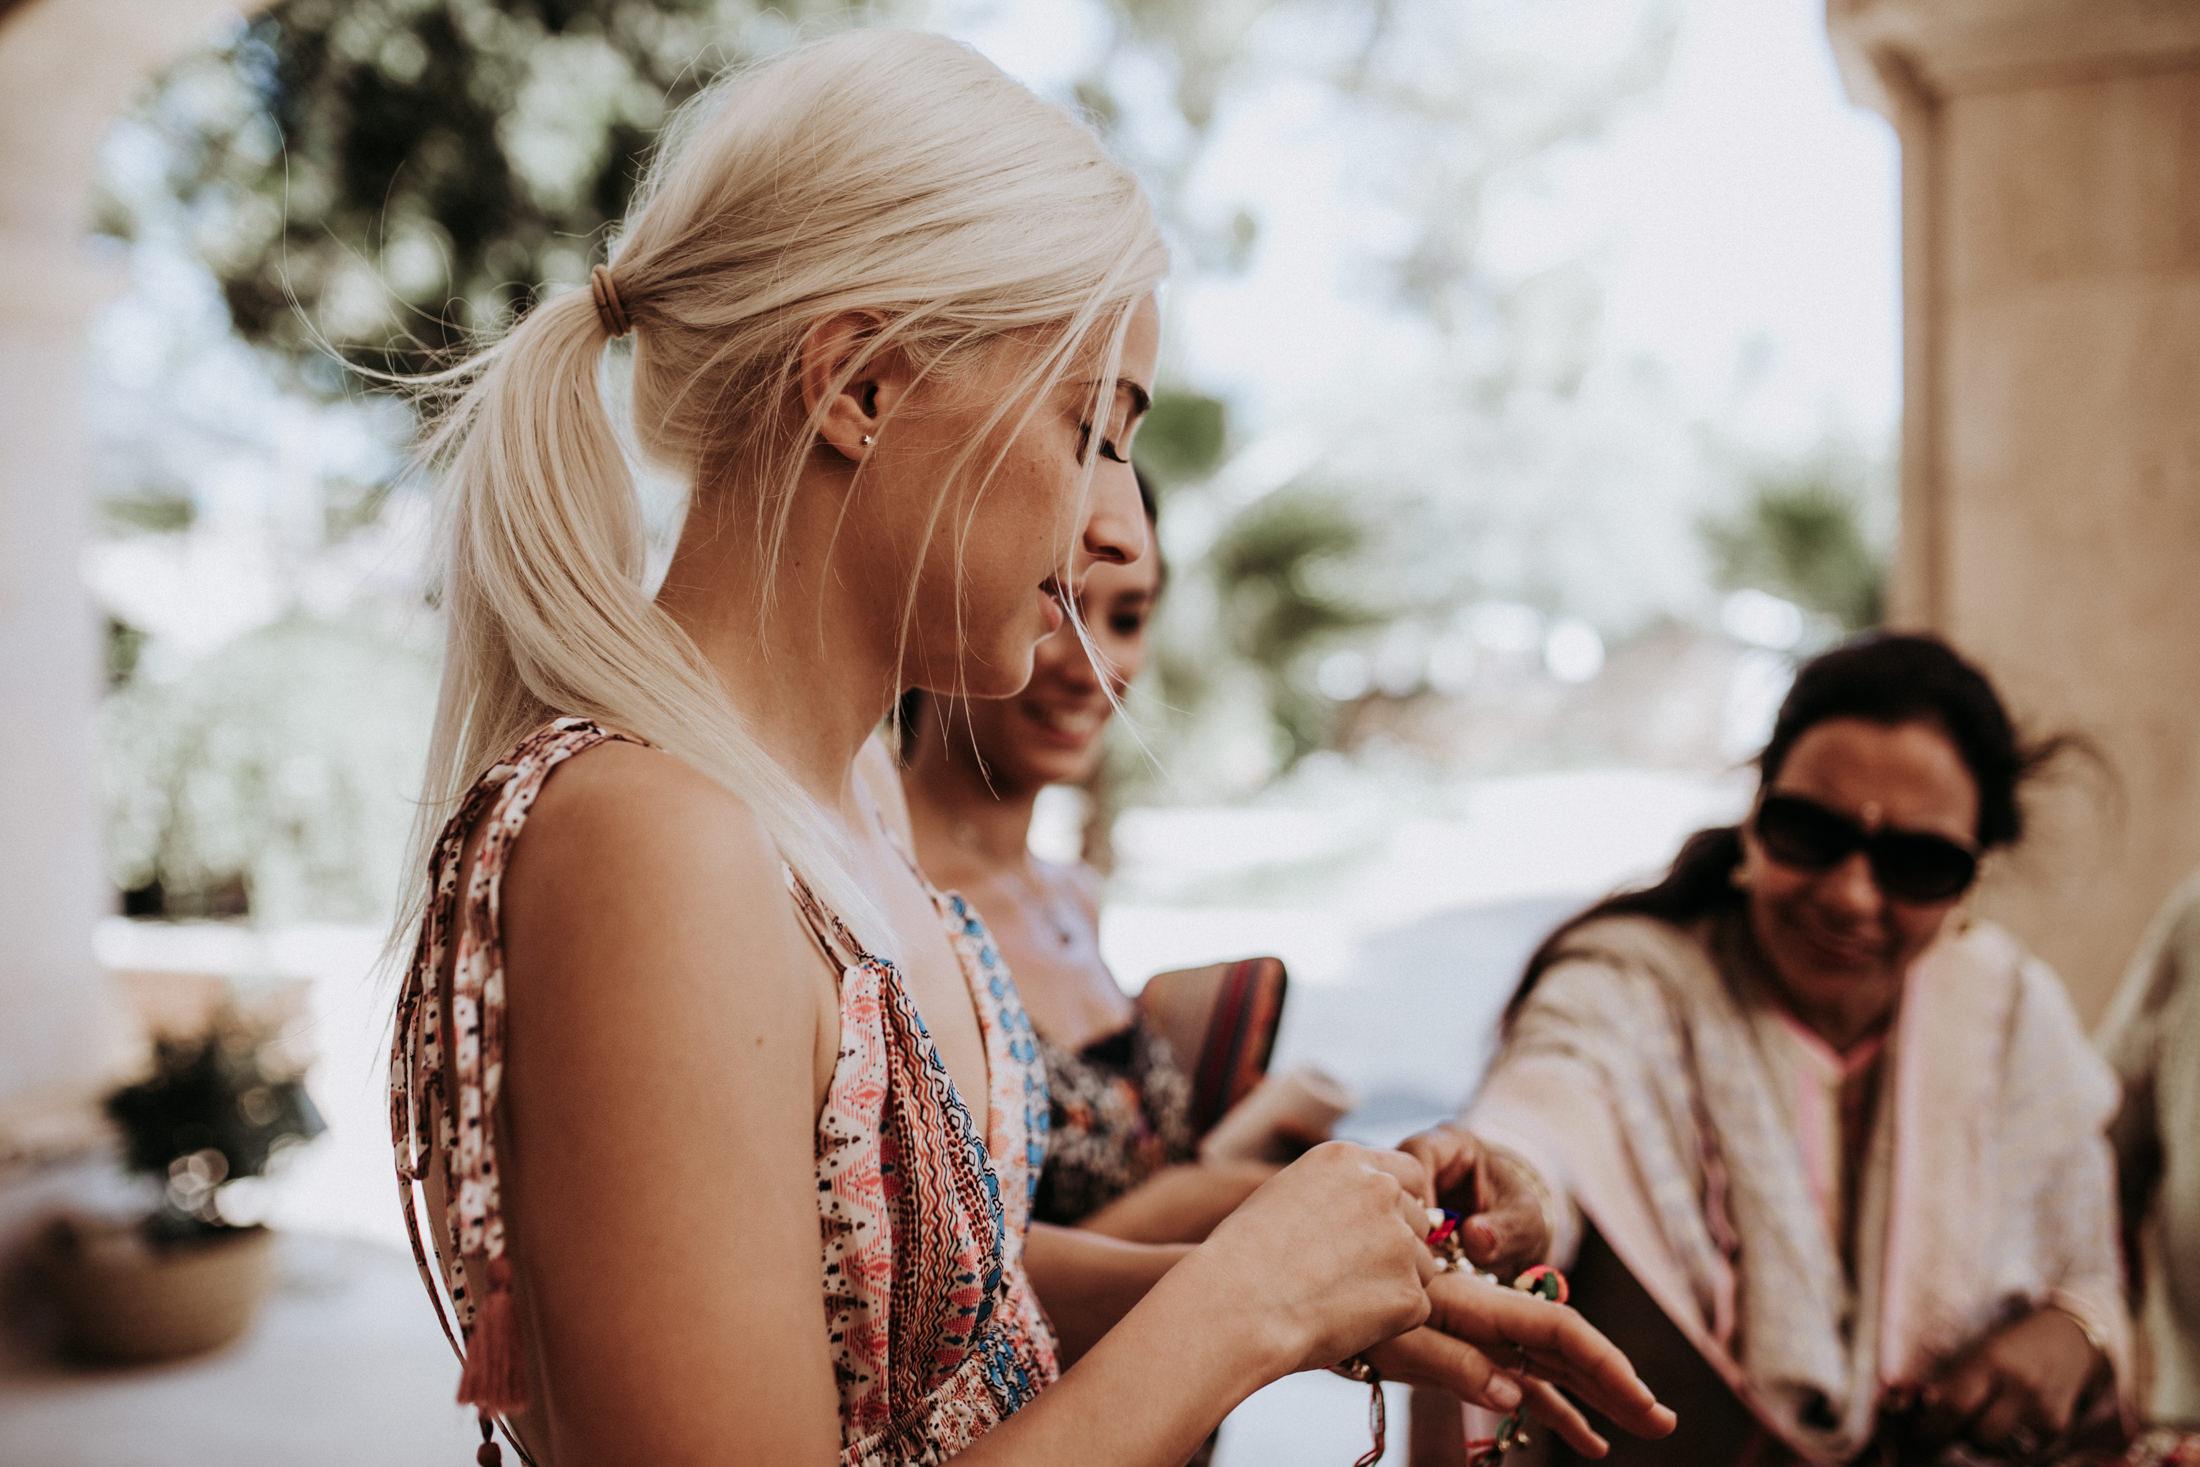 Wedding_Photographer_Mallorca_Daniela-Marquardt_Photography_New_York_Iceland_Tuscany_Santorini_Portugal_Austria_Bavaria_Elopement_Hochzeitsfotograf_AntjeRajat1_12